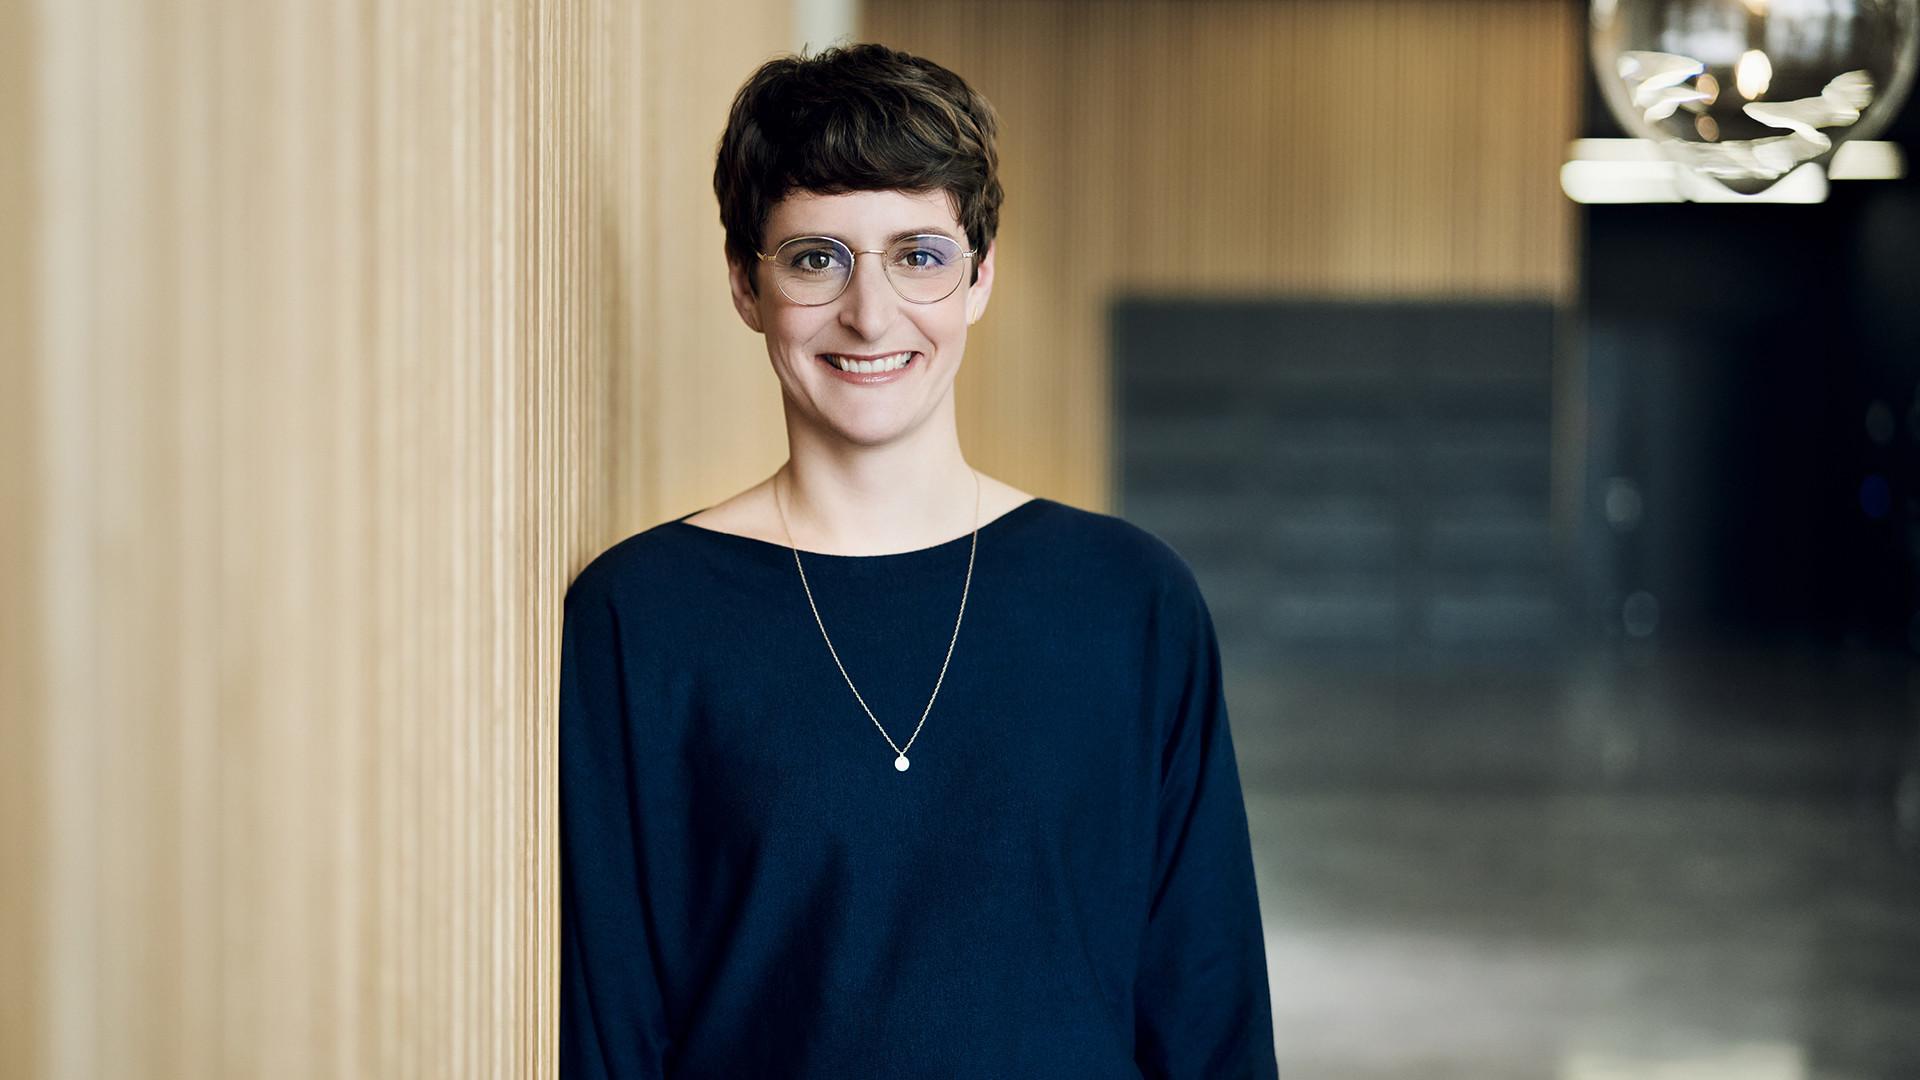 Dr. Johanna Klewitz, vodja ekipe za trajnostno upravljanje dobavne verige